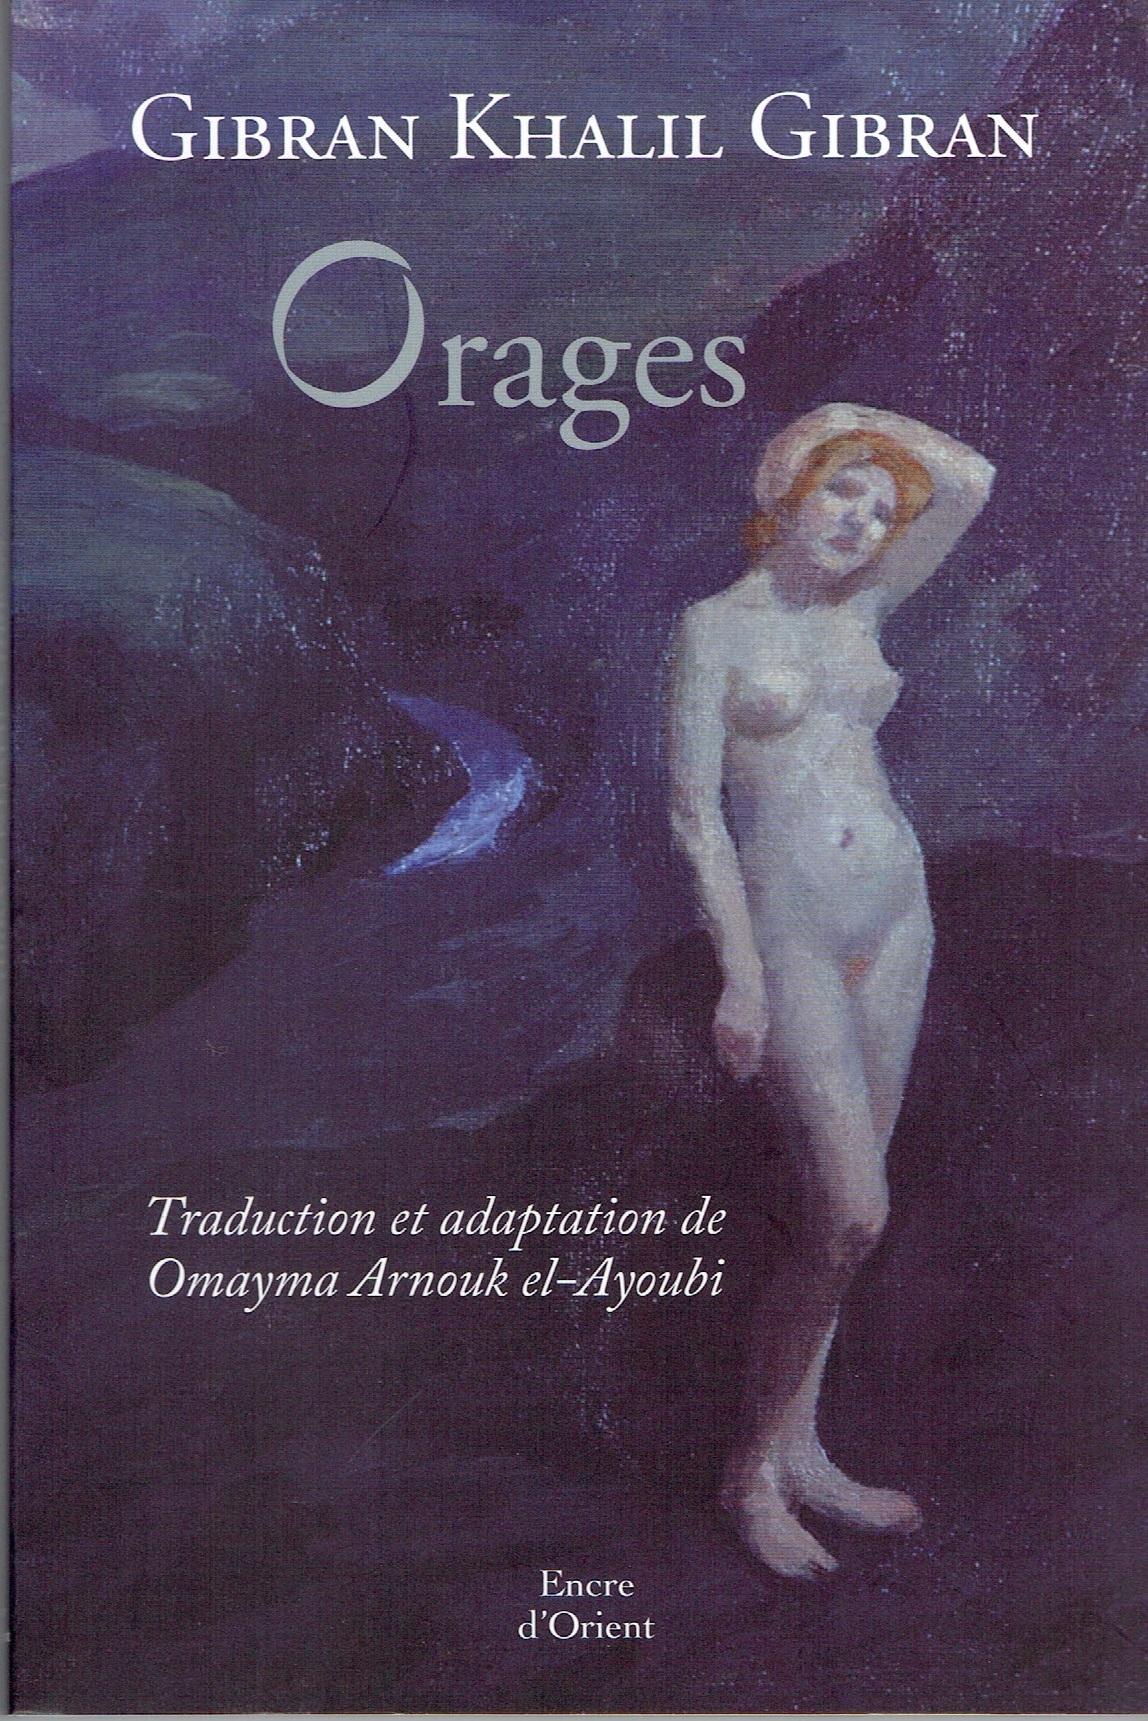 ORAGES DE GIBRAN KHALIL GIBRAN